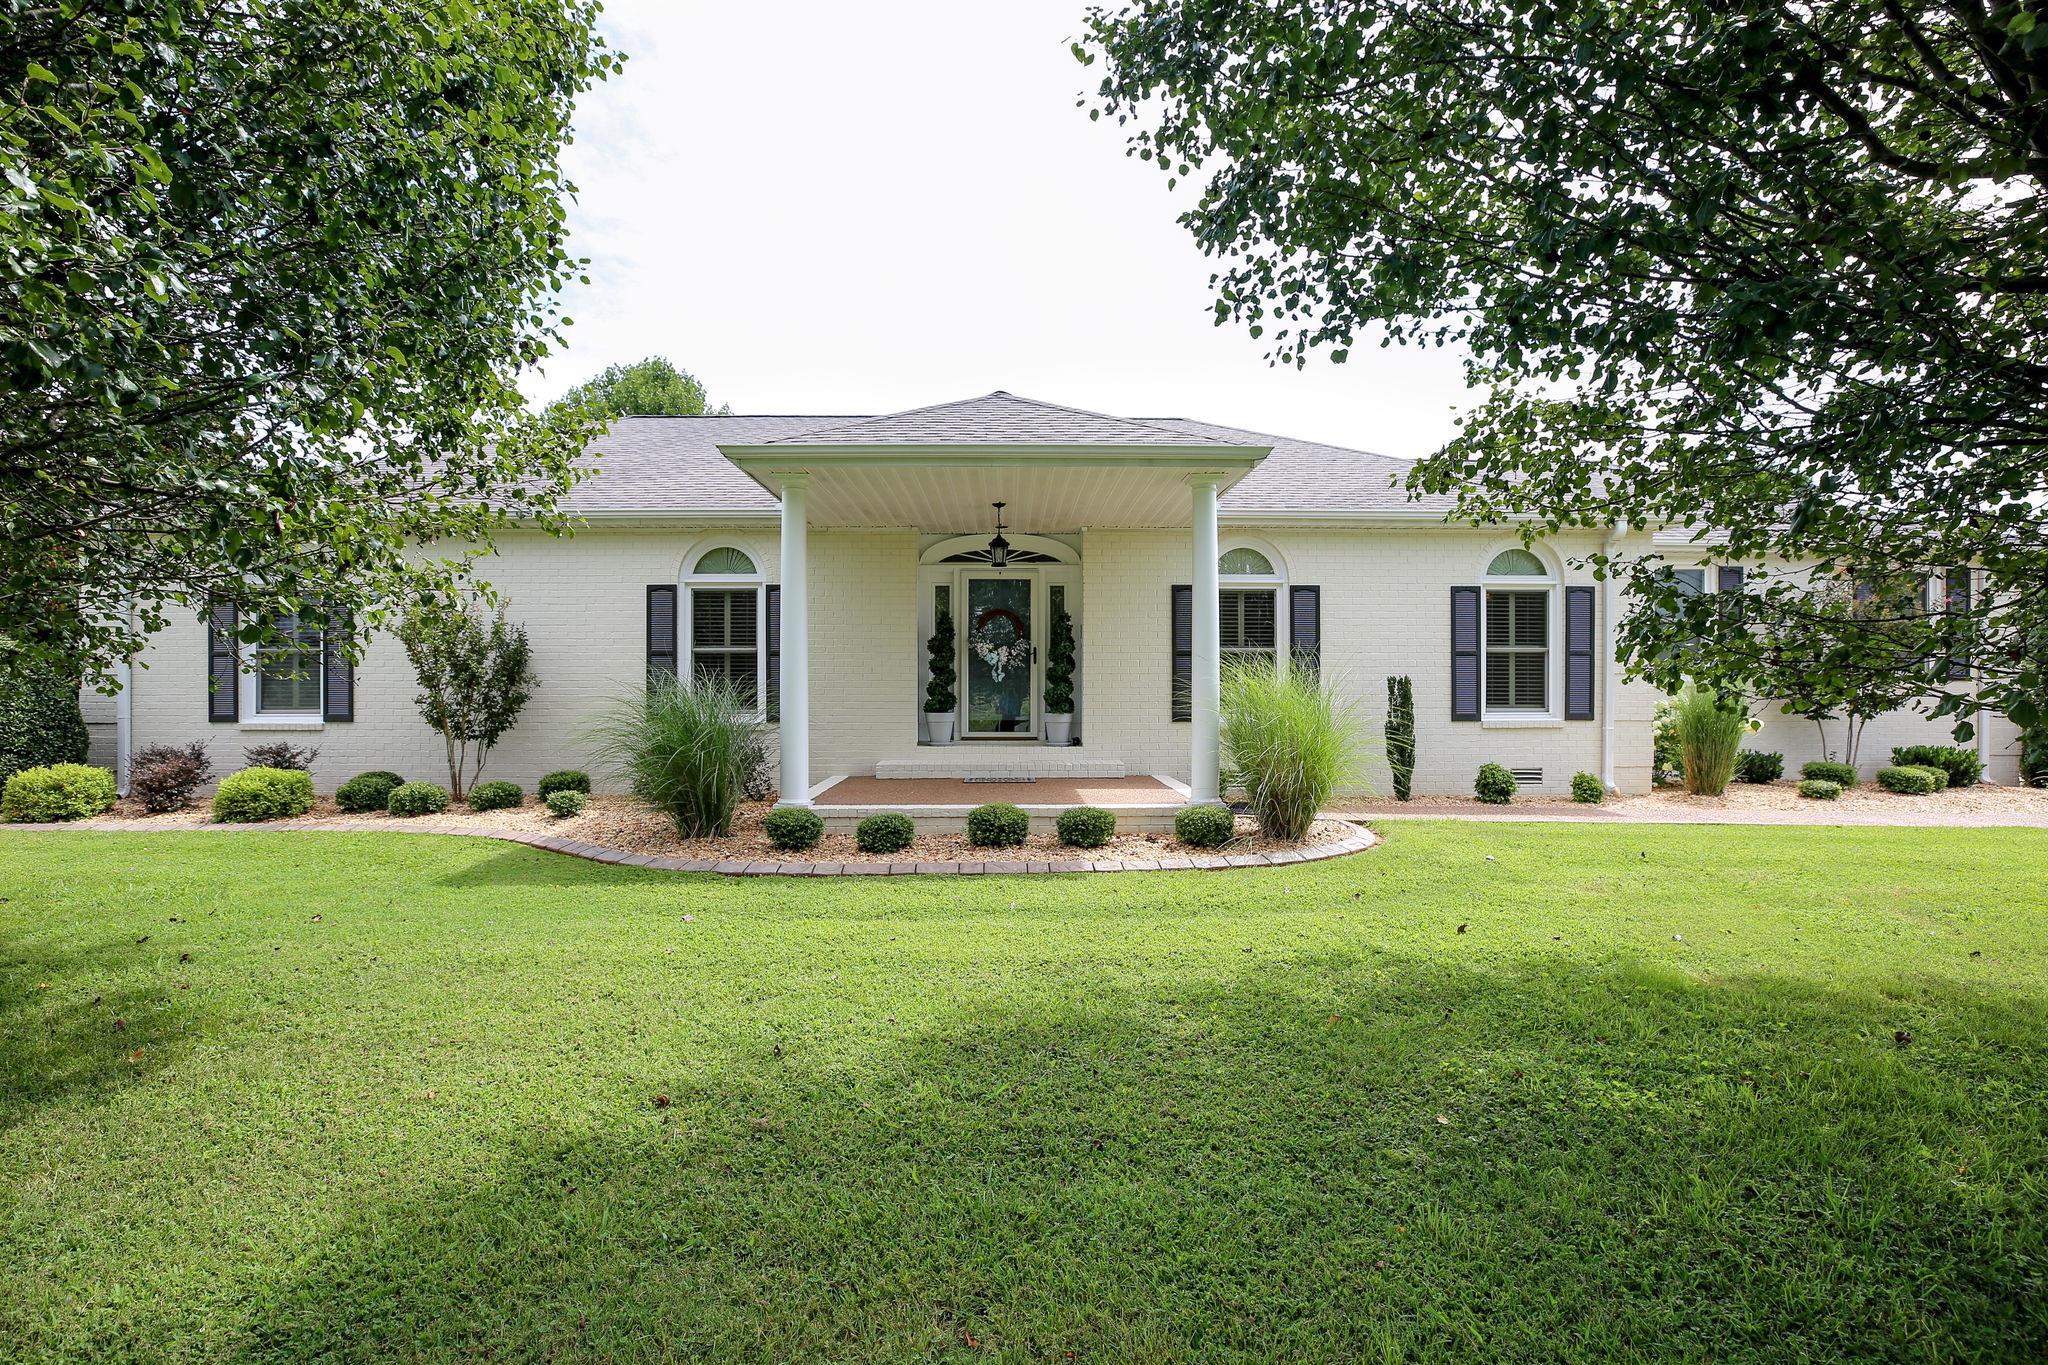 2001 Red Mile Rd, Murfreesboro, TN 37127 - Murfreesboro, TN real estate listing